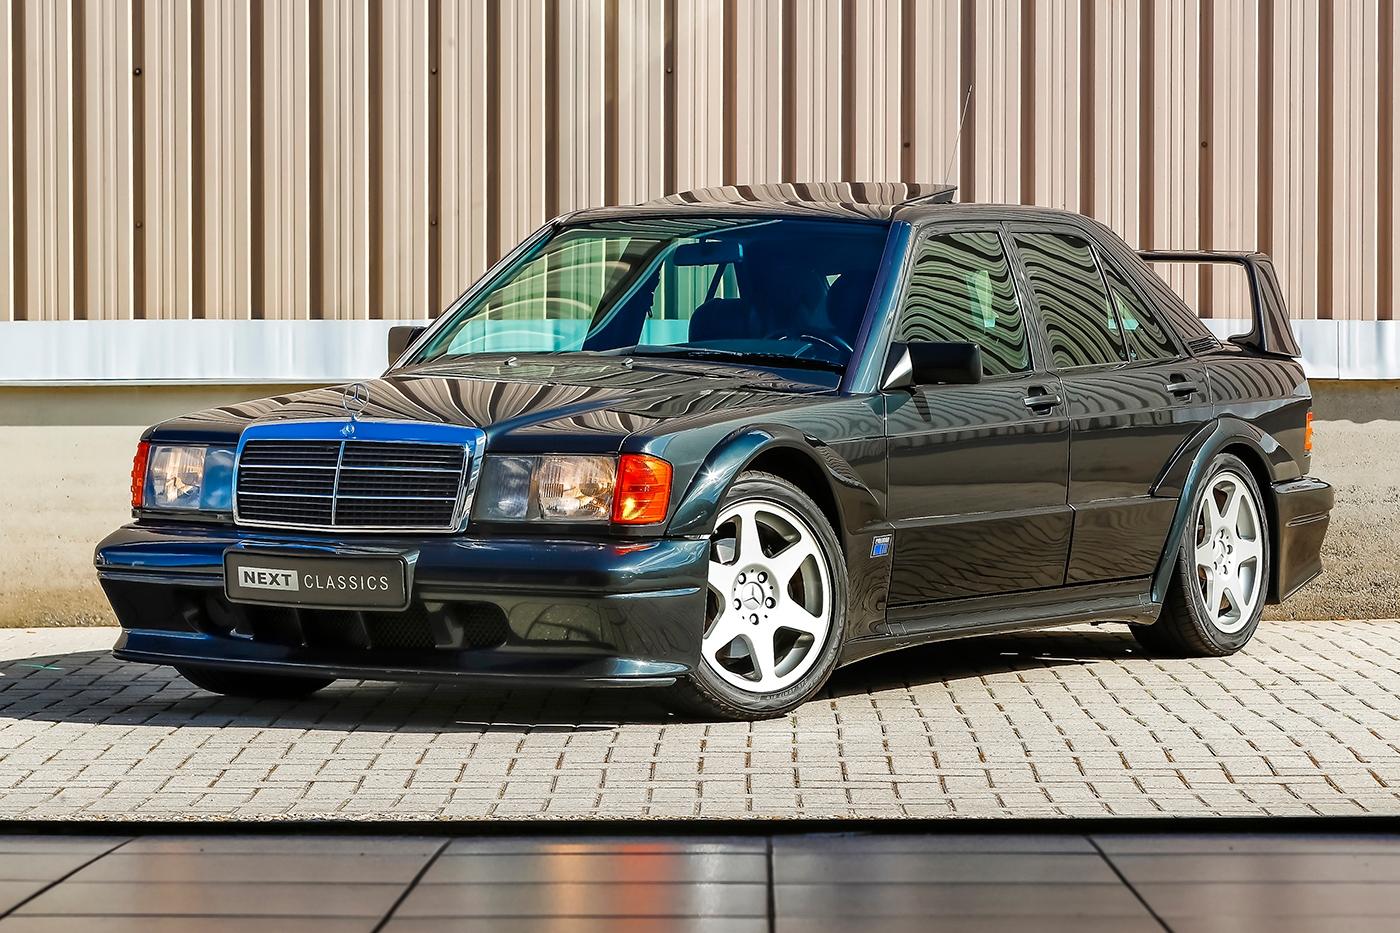 Mercedes-Benz 190E 2.5 16 Evo II 1990 asta